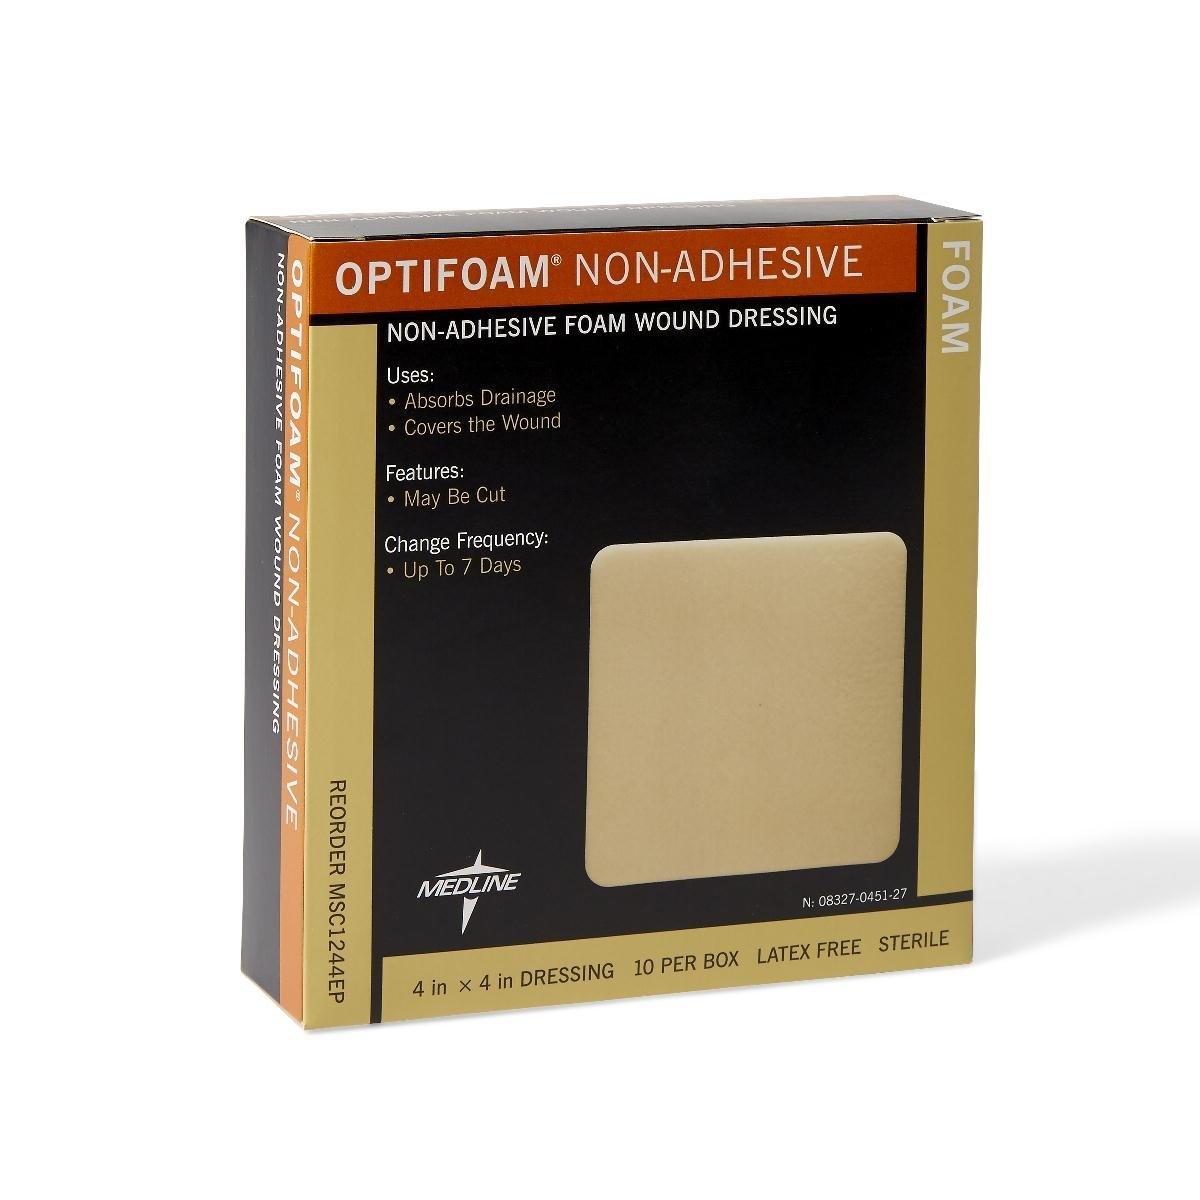 Medline MSC1244EPZ Optifoam Non-Adhesive Dressings, 4'' x 4'' (Pack of 10)